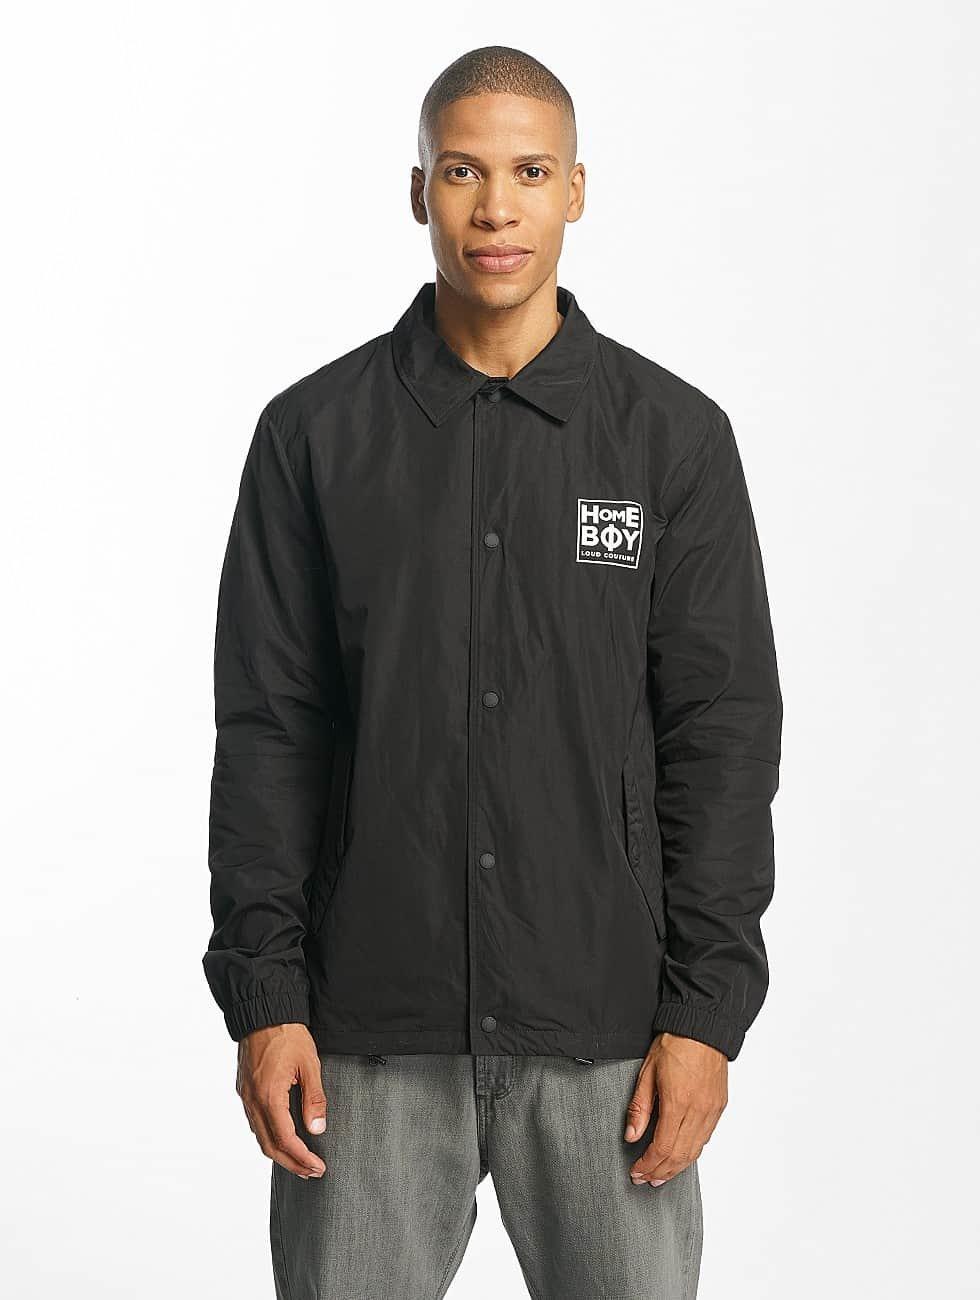 Homeboy Lightweight Jacket Coach black